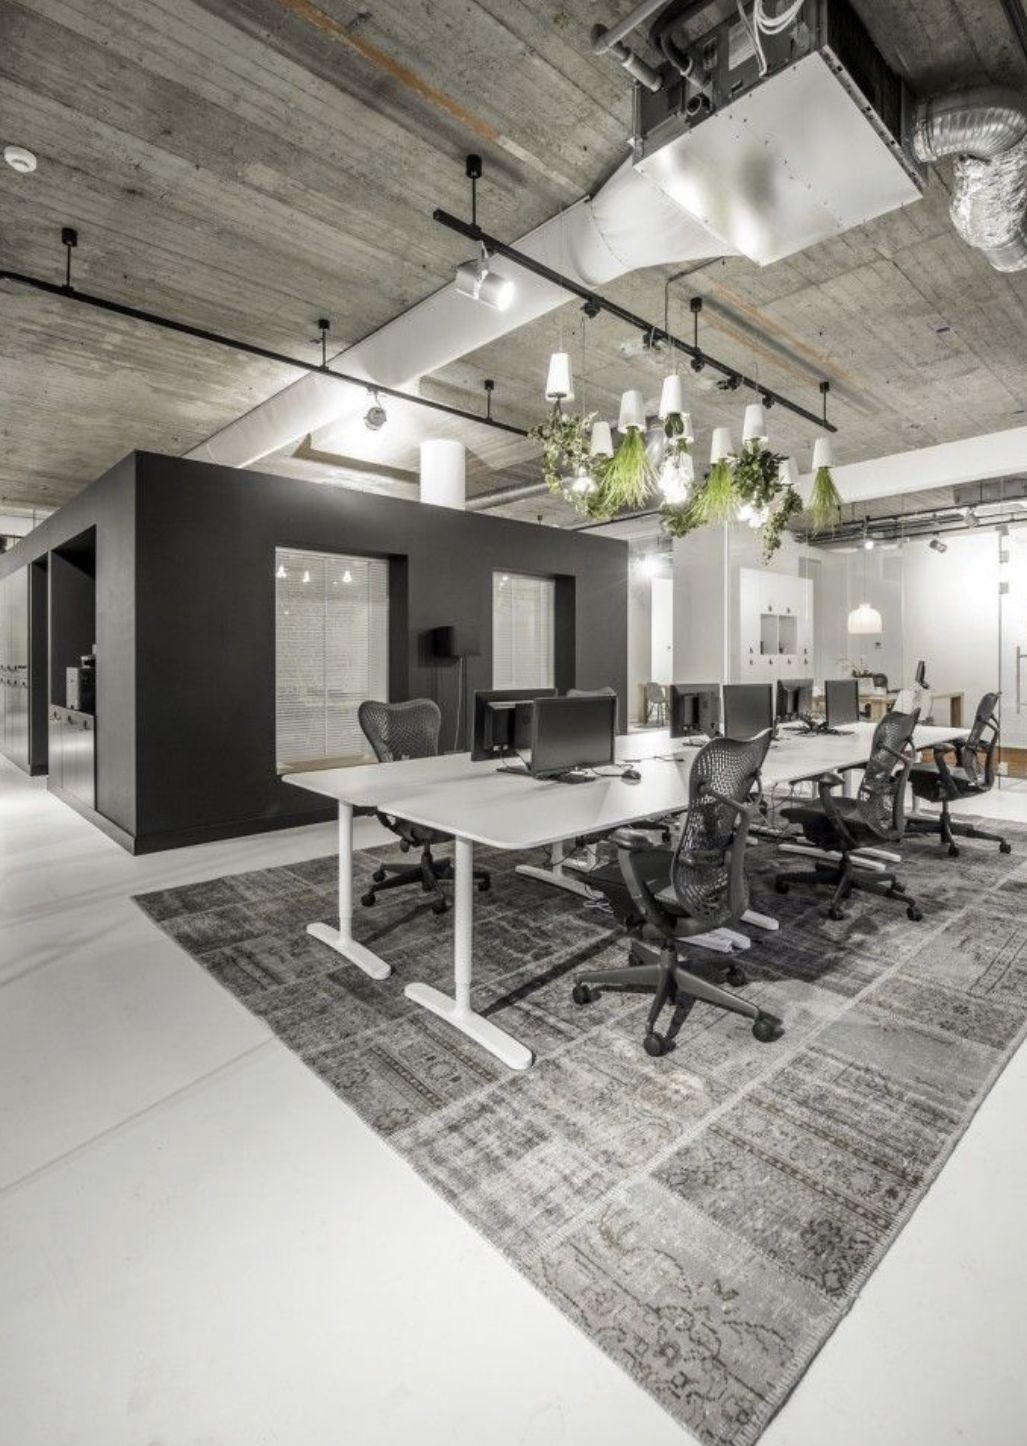 Office Space Modern Industrial Office Interior Design Homyracks